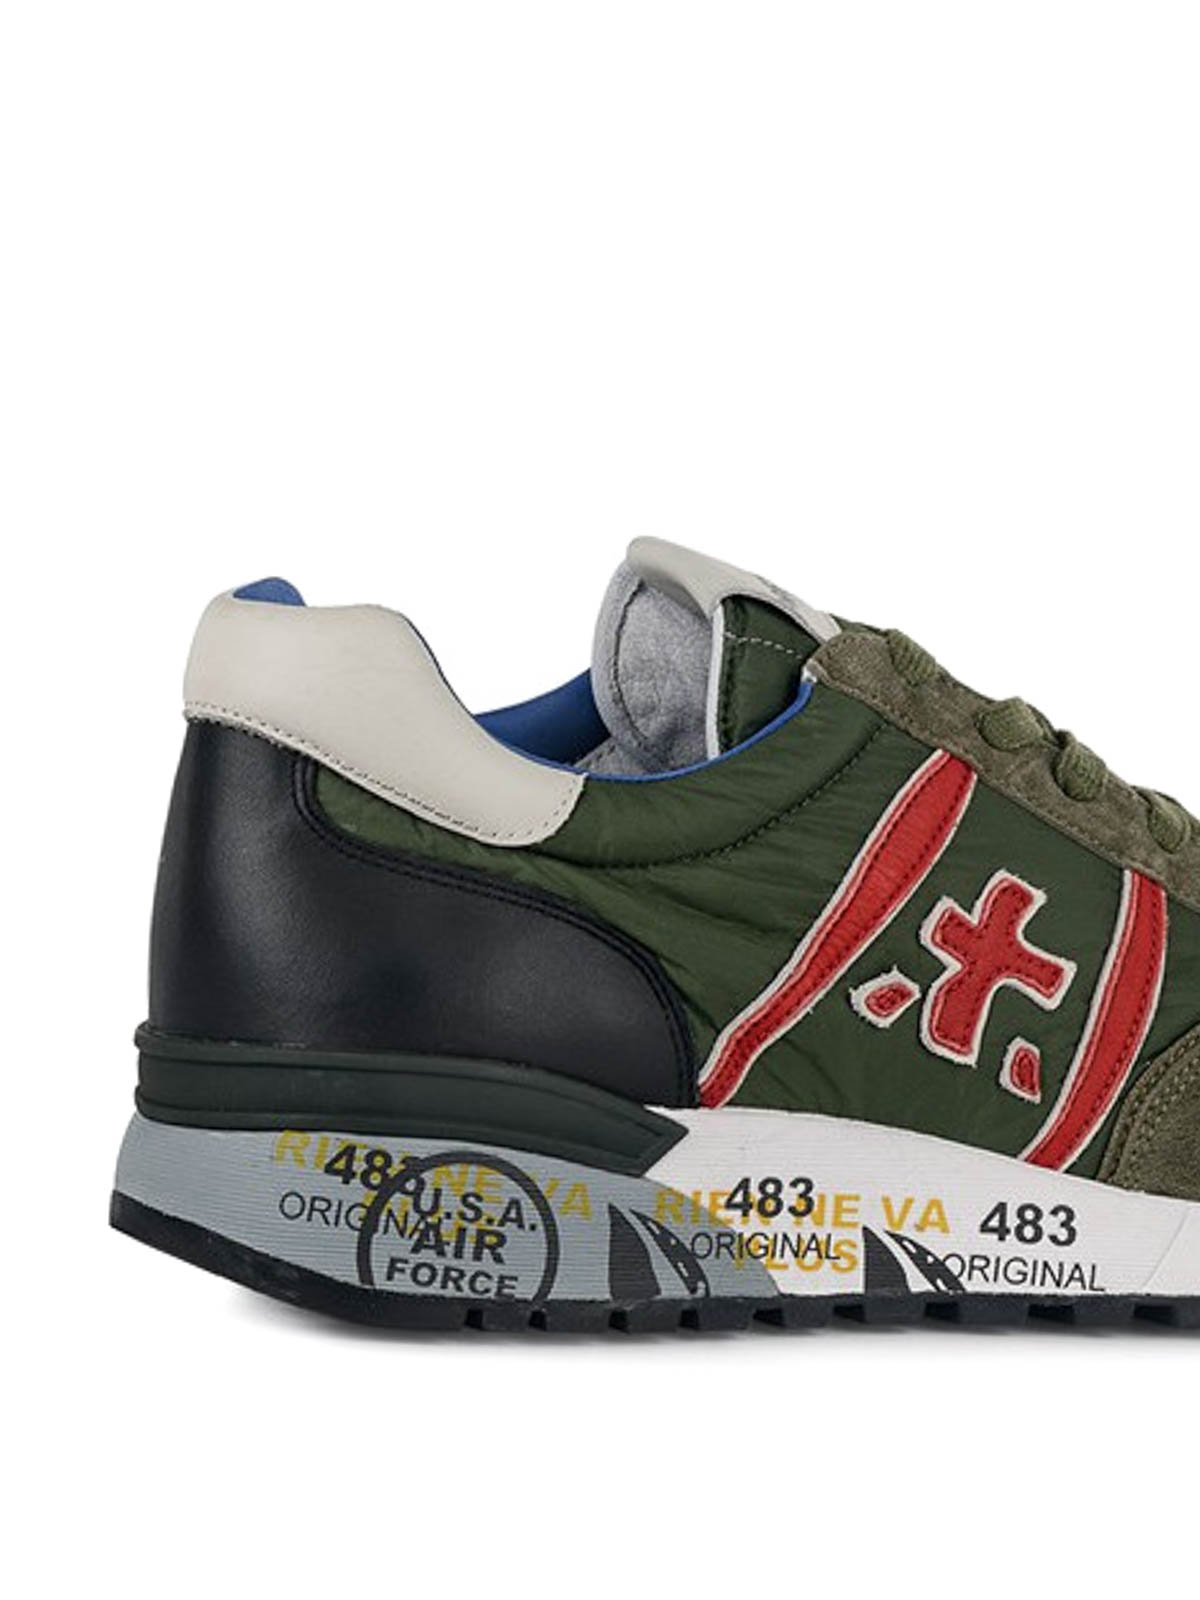 9dad3ce30e519 Premiata - Sneaker Lander 1458 - sneakers - LANDER 1458